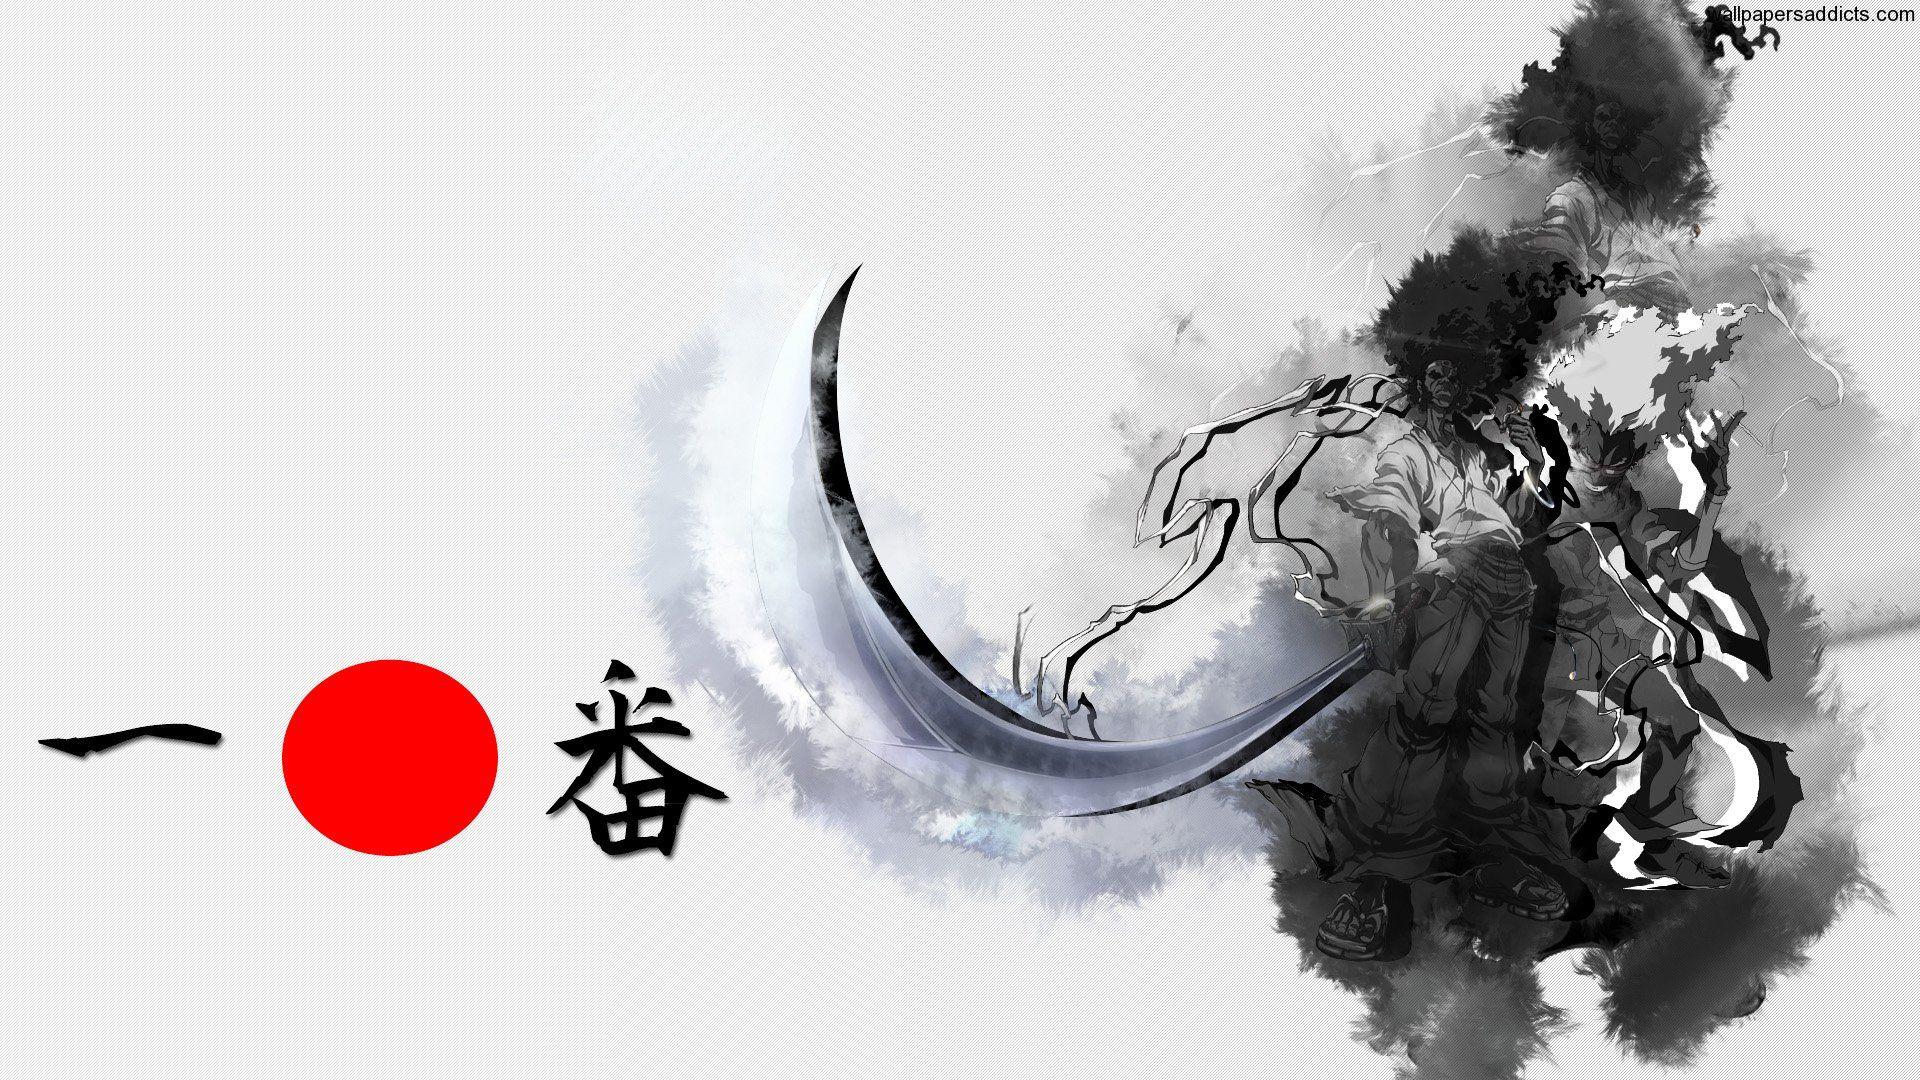 Afro samurai cartoon wallpaper image for tablet cartoons afro samurai cartoon wallpaper image for tablet cartoons wallpapers voltagebd Images